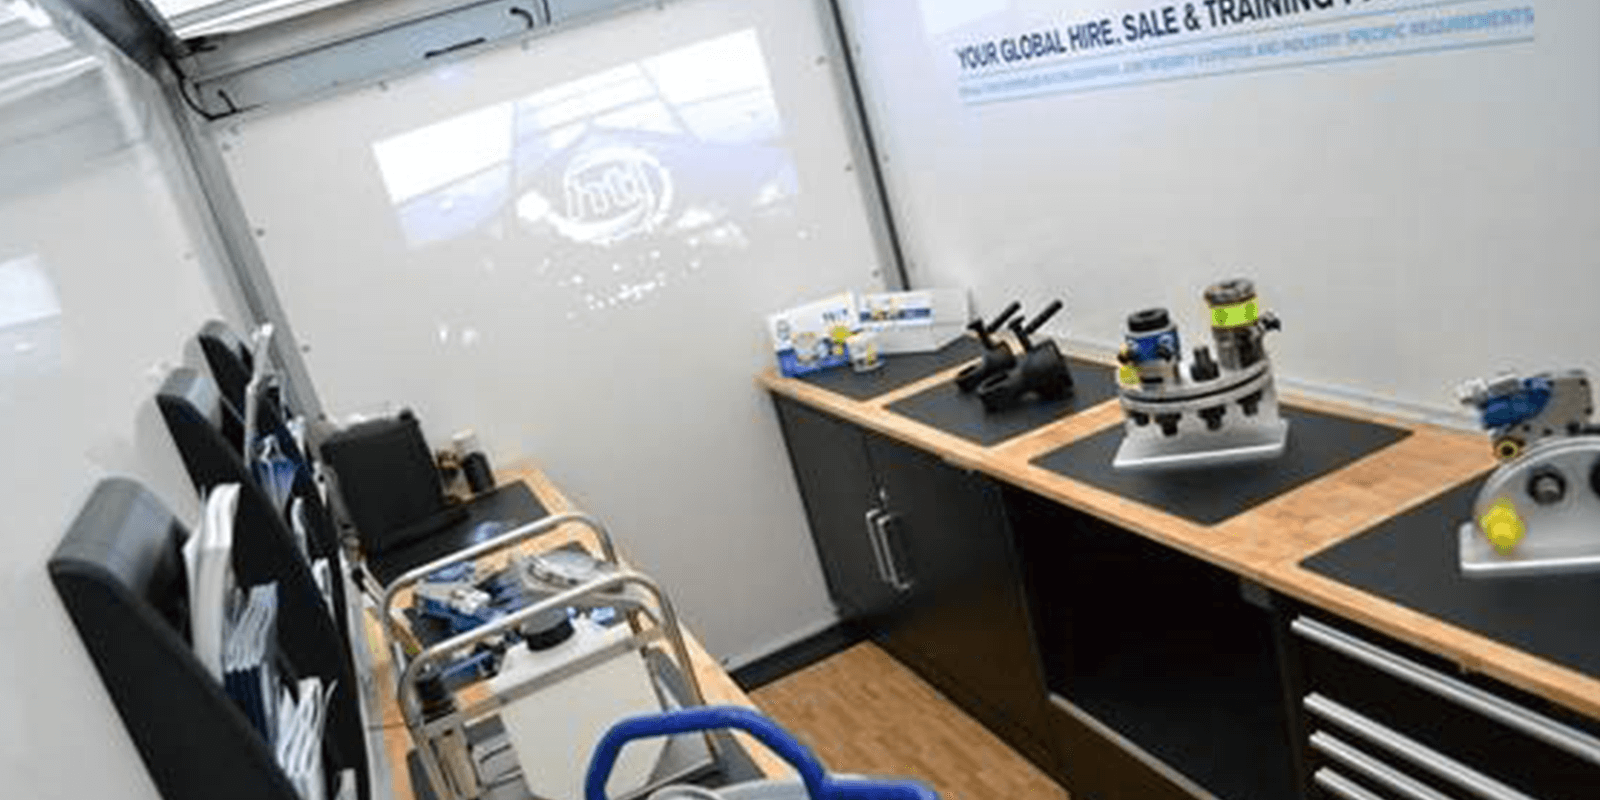 Expo Van Inside Product Gallery